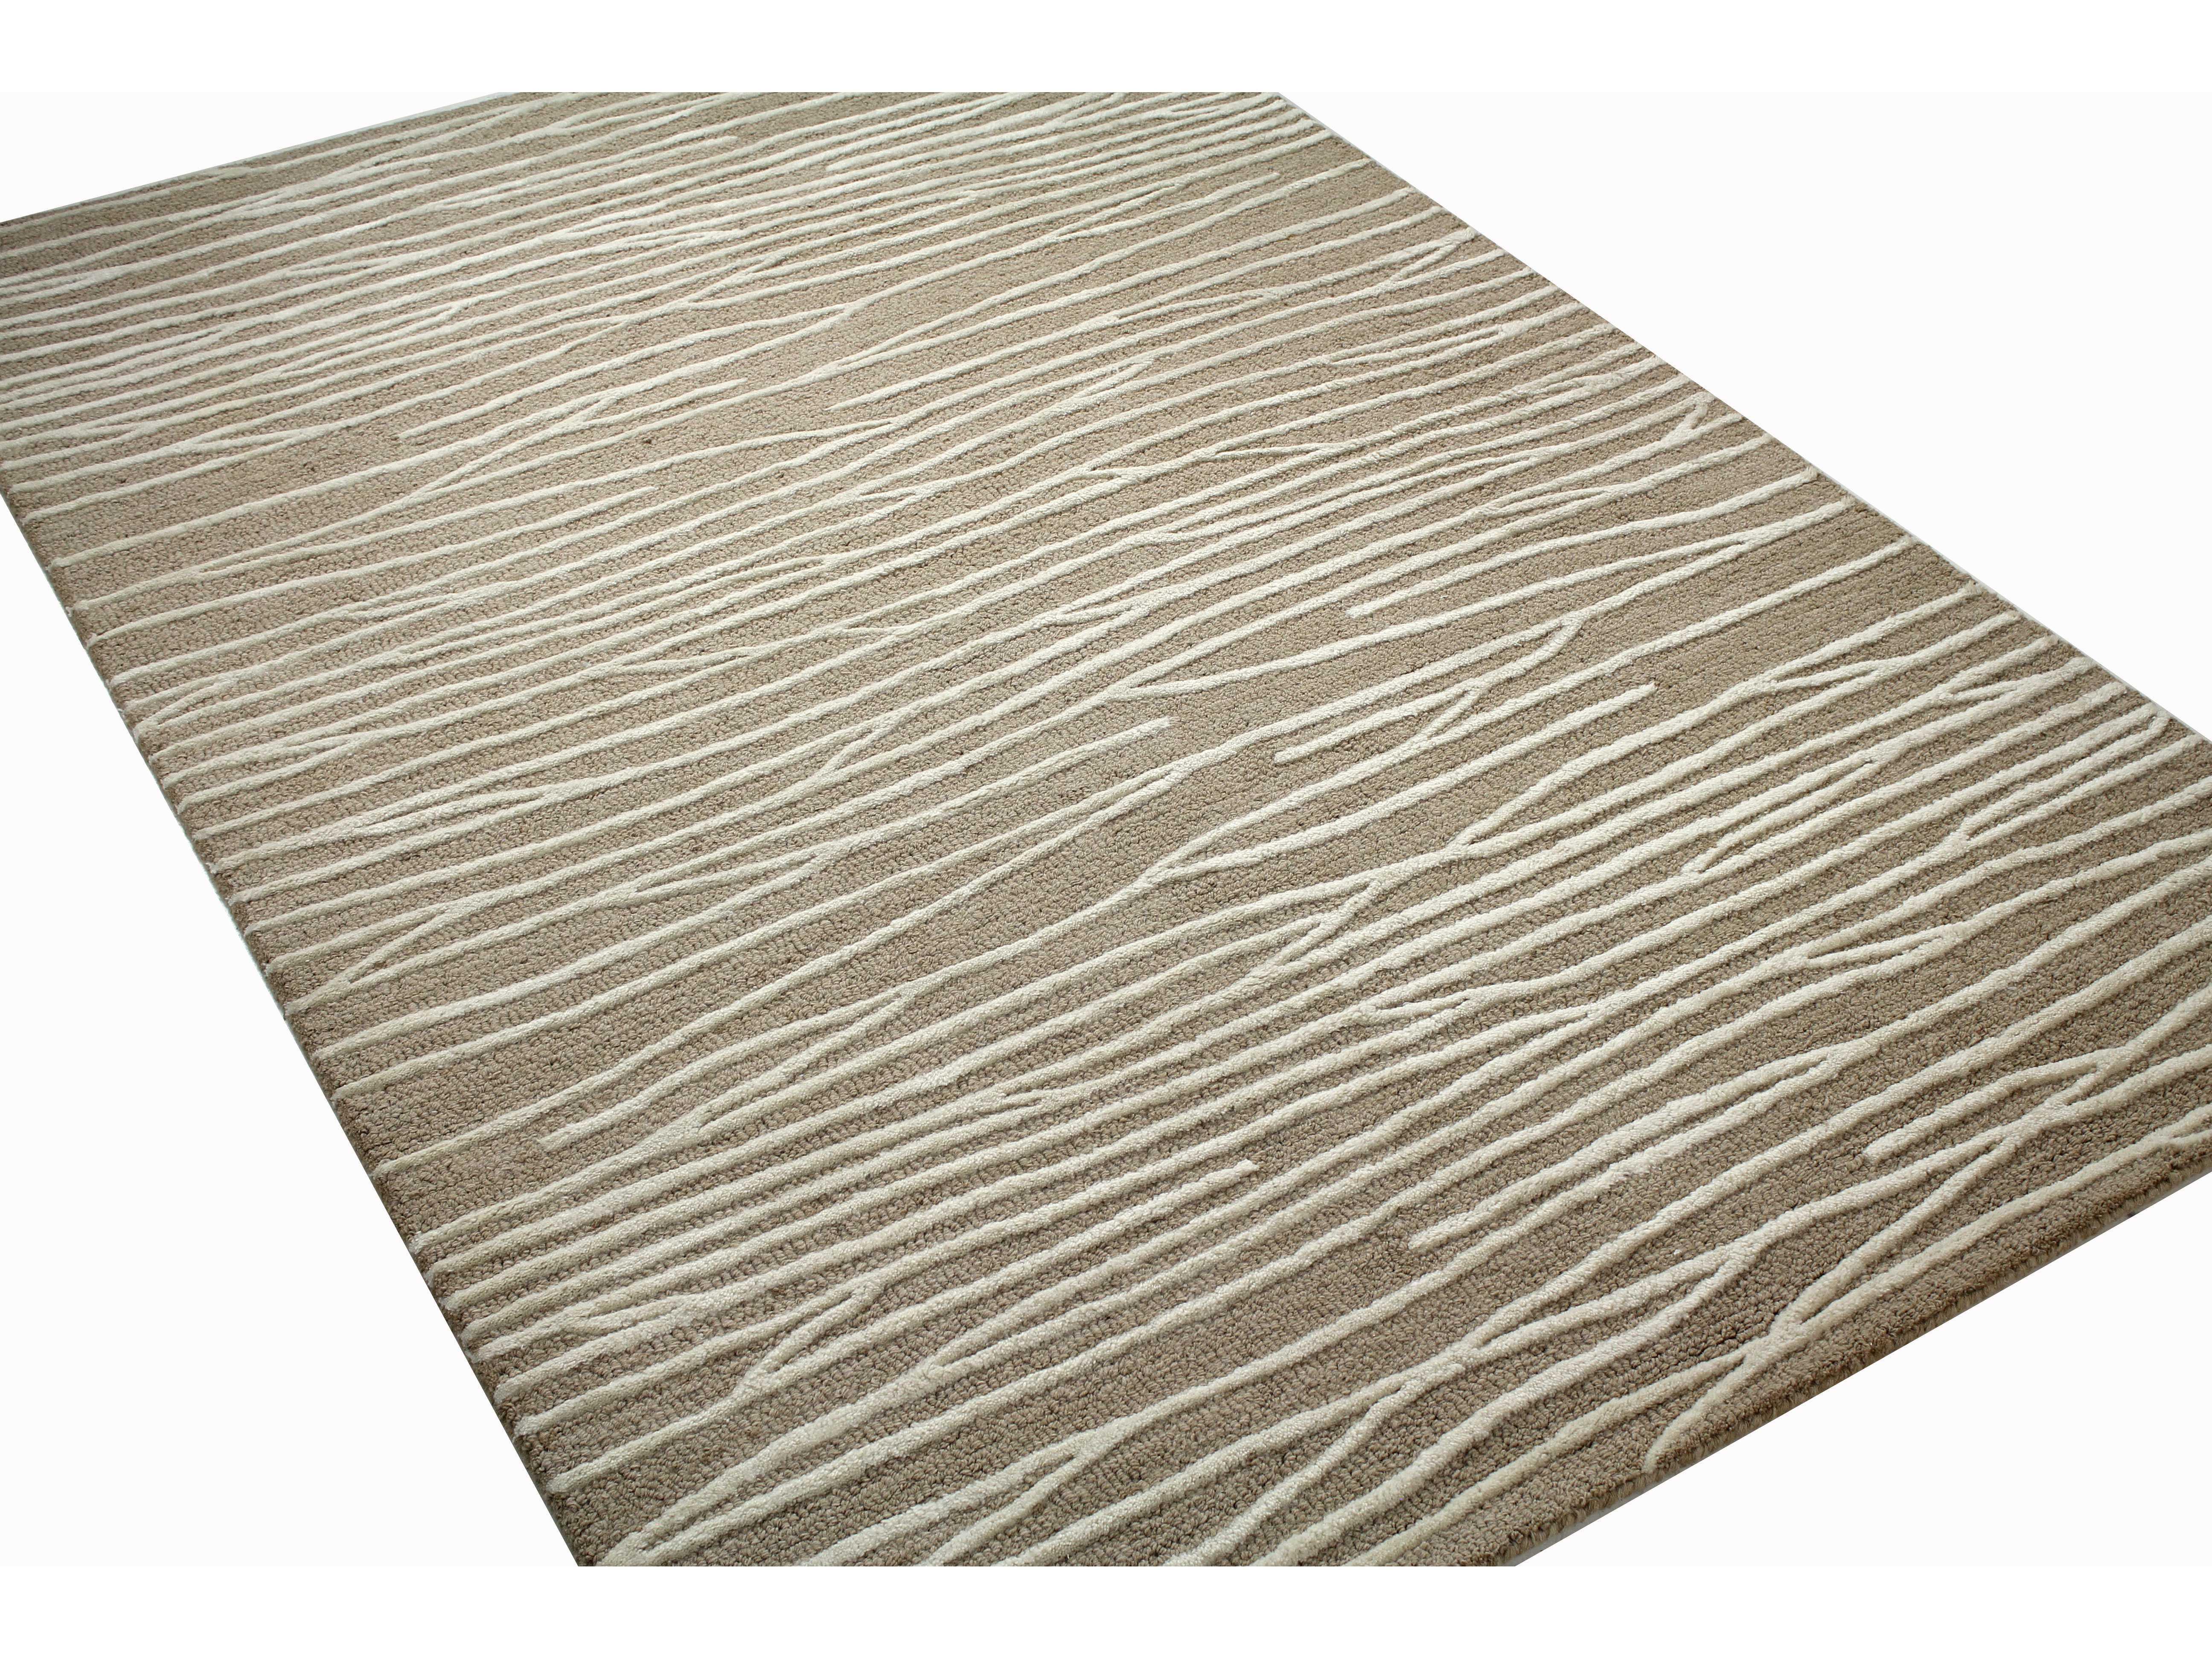 bashian rugs westwood rectangular beige area rug r135 be